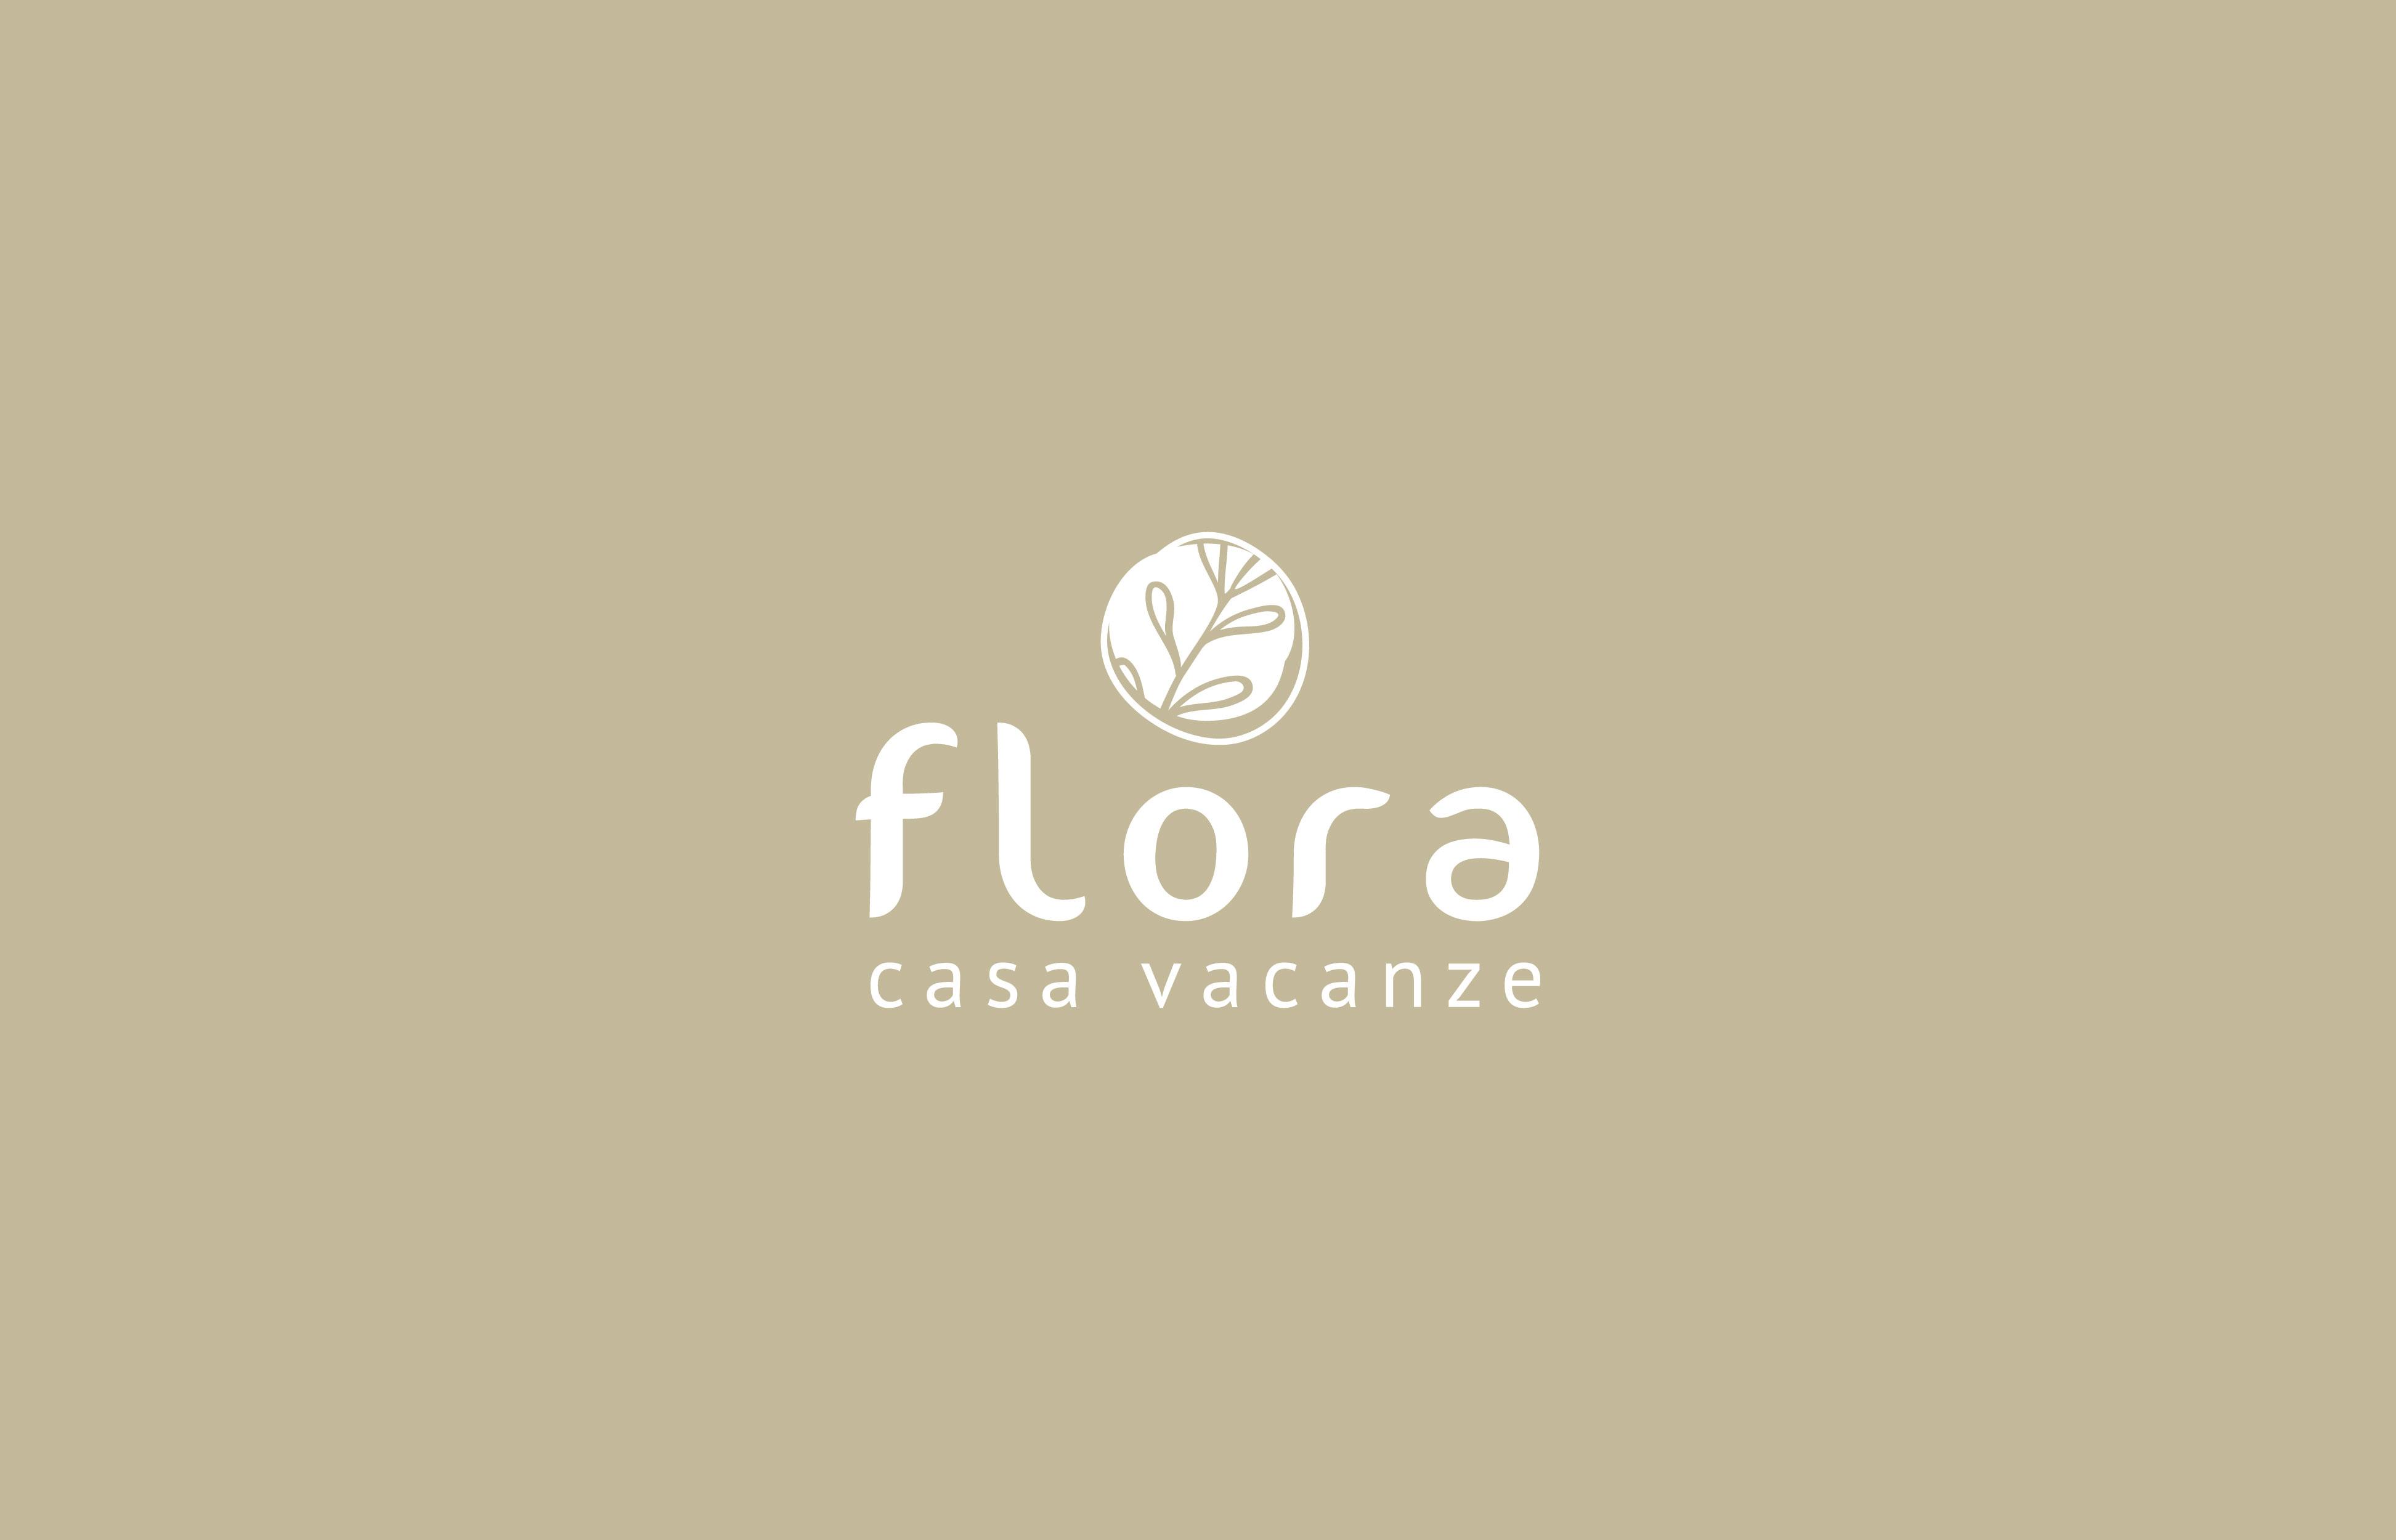 FLORA-02